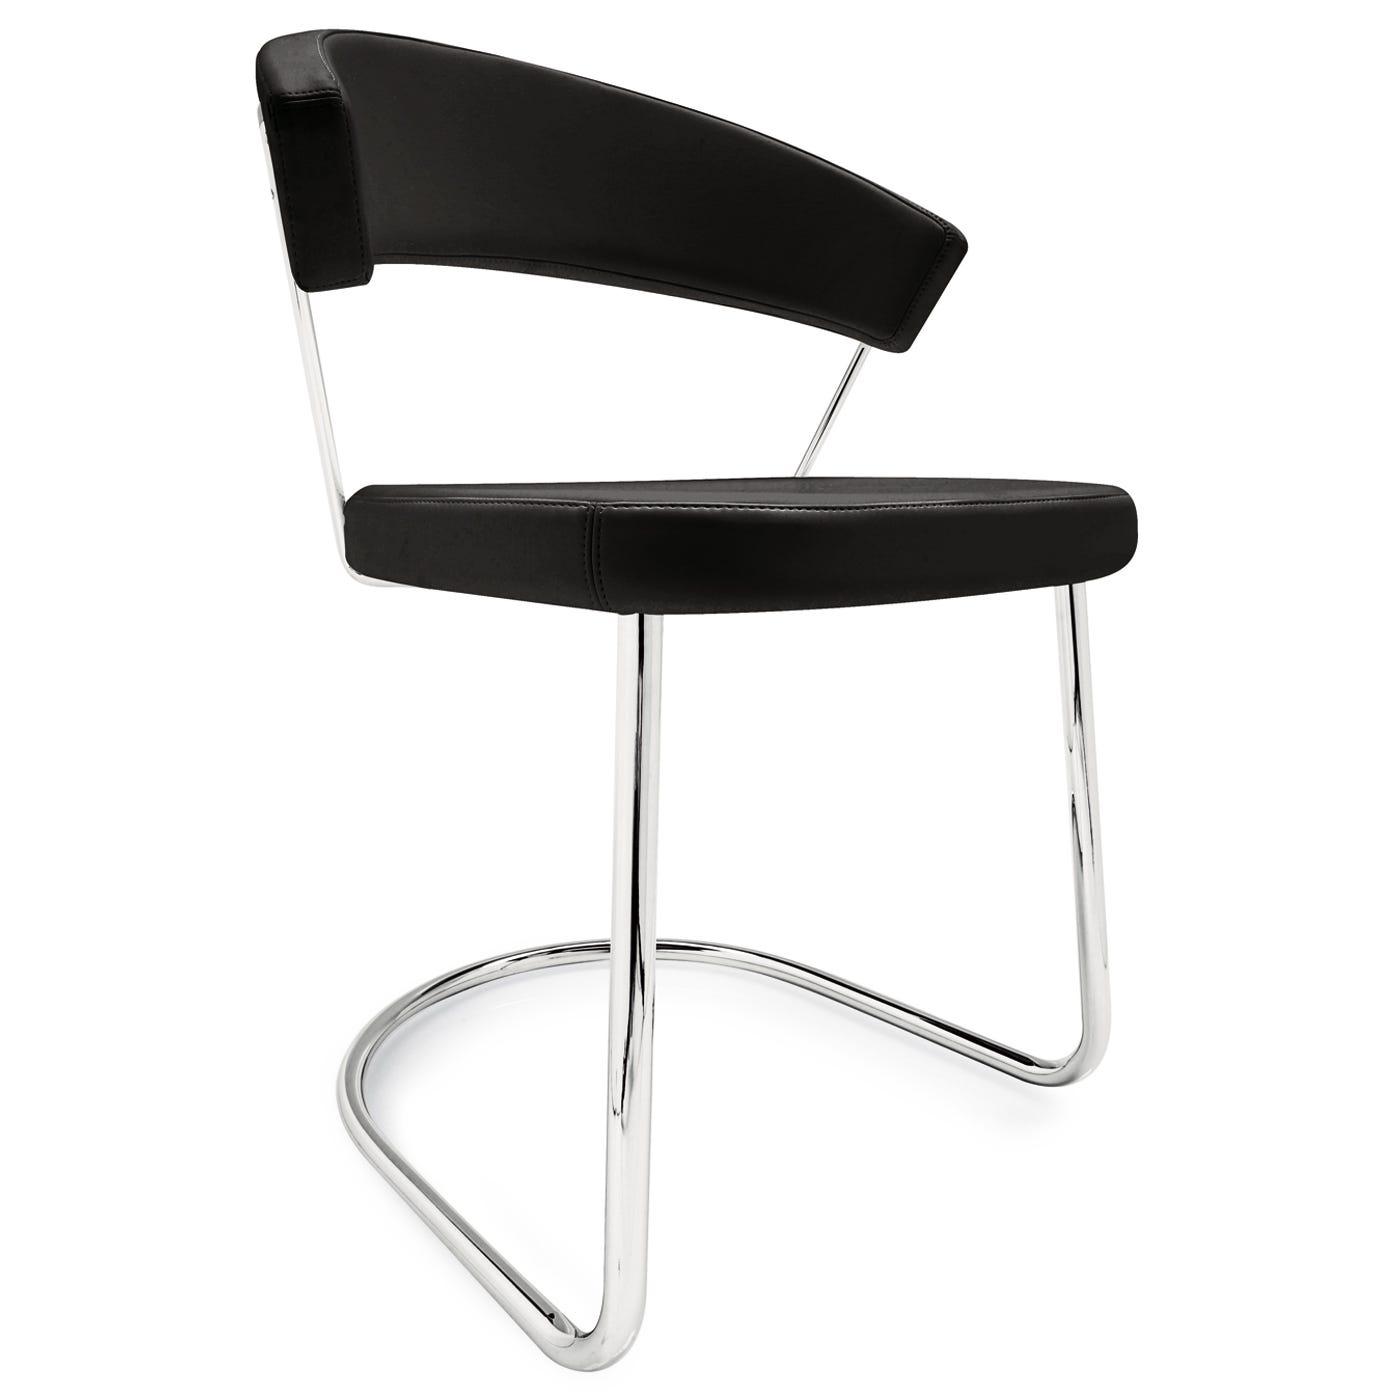 New York Leather Chair Sleigh Legs